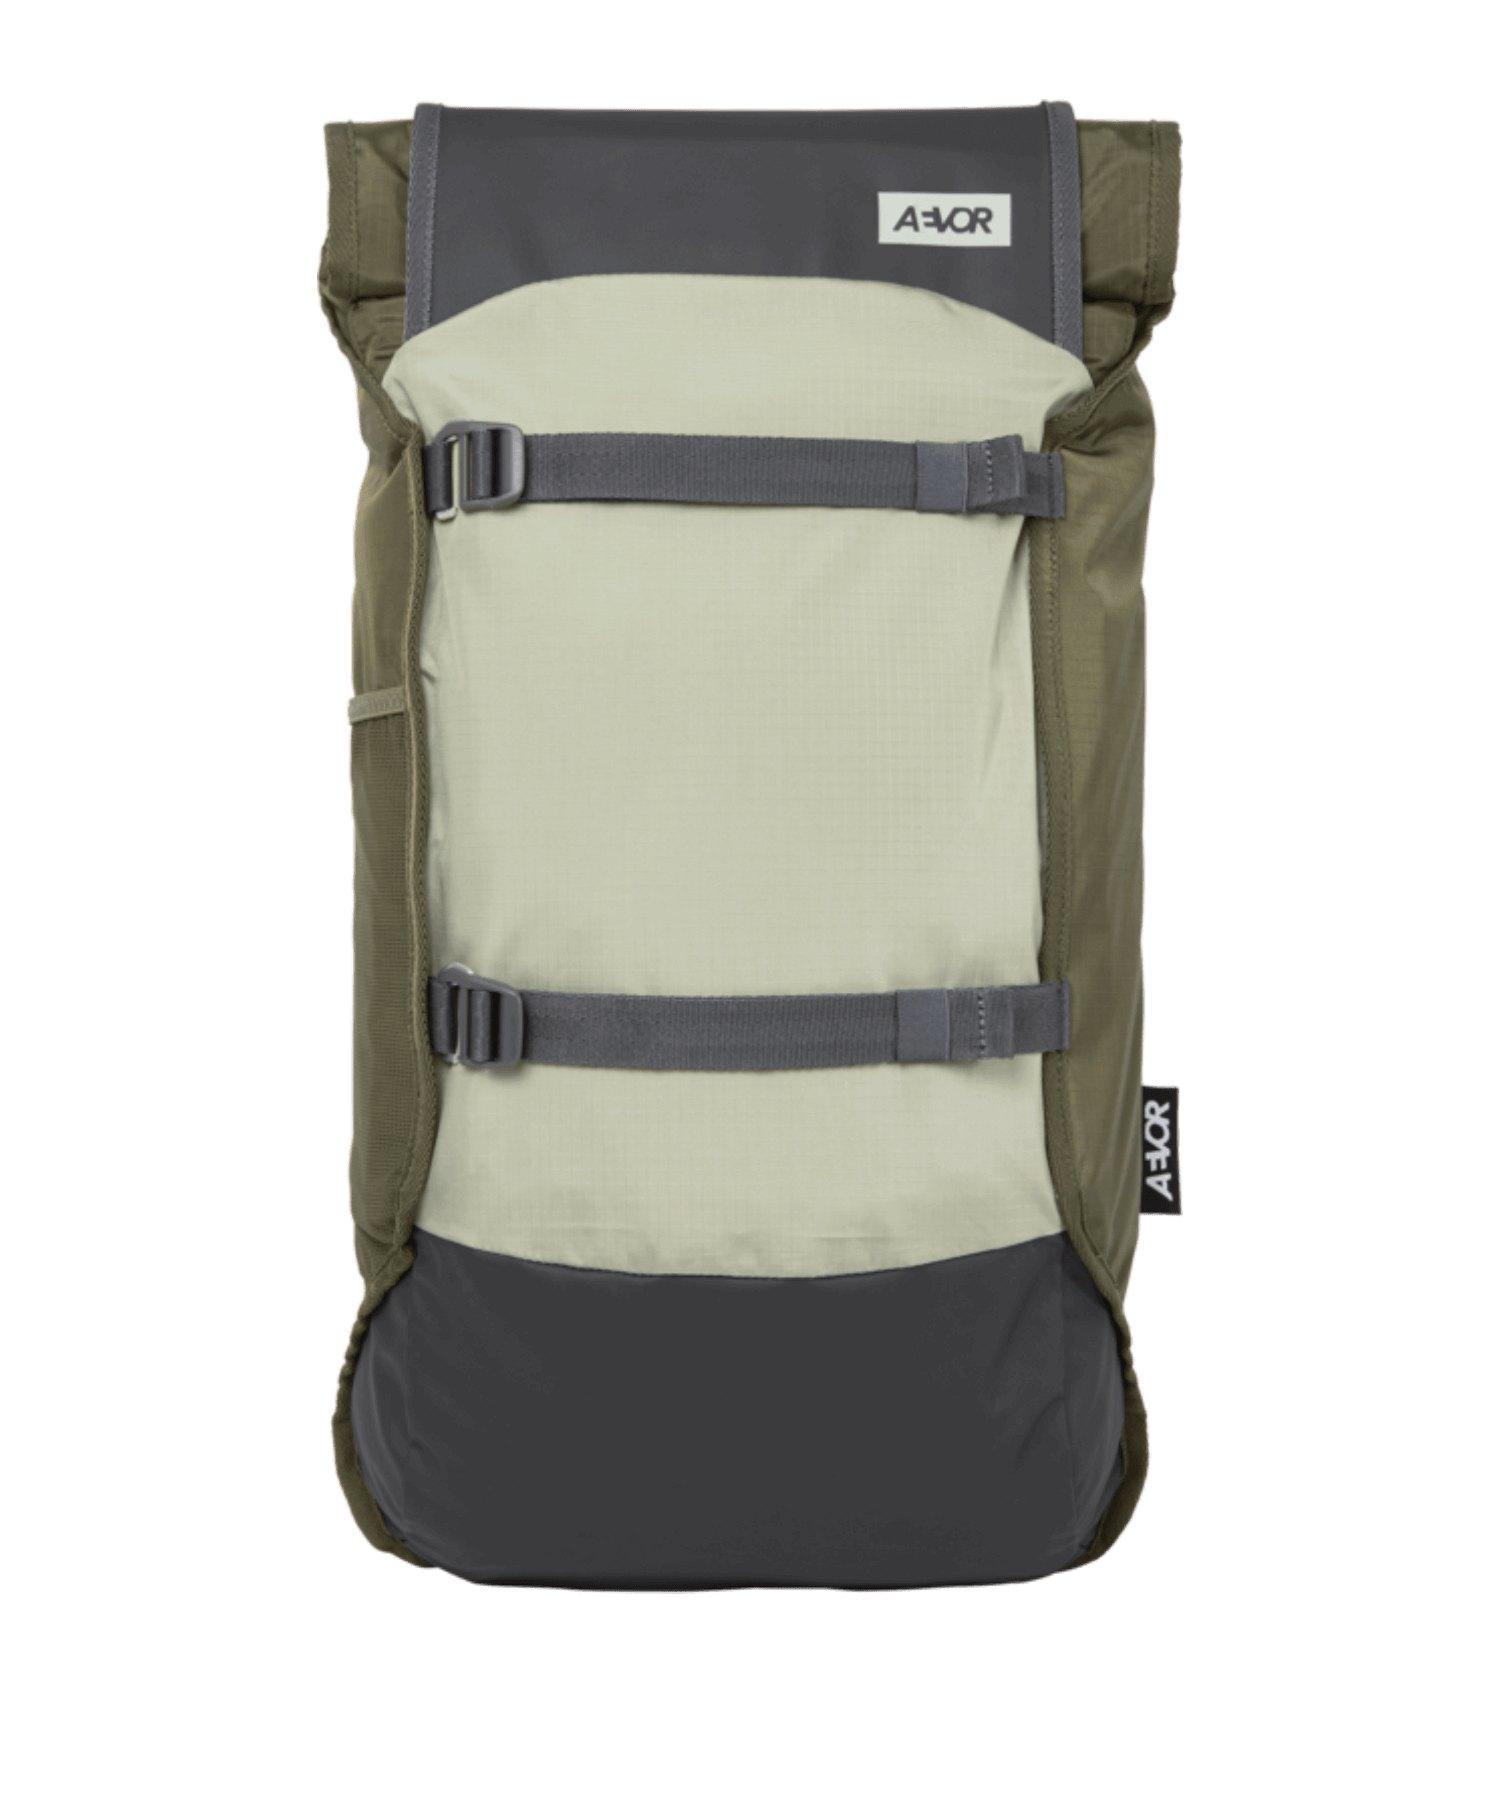 AEVOR Backpack Trip Pack Rucksack Grün F255A - gruen